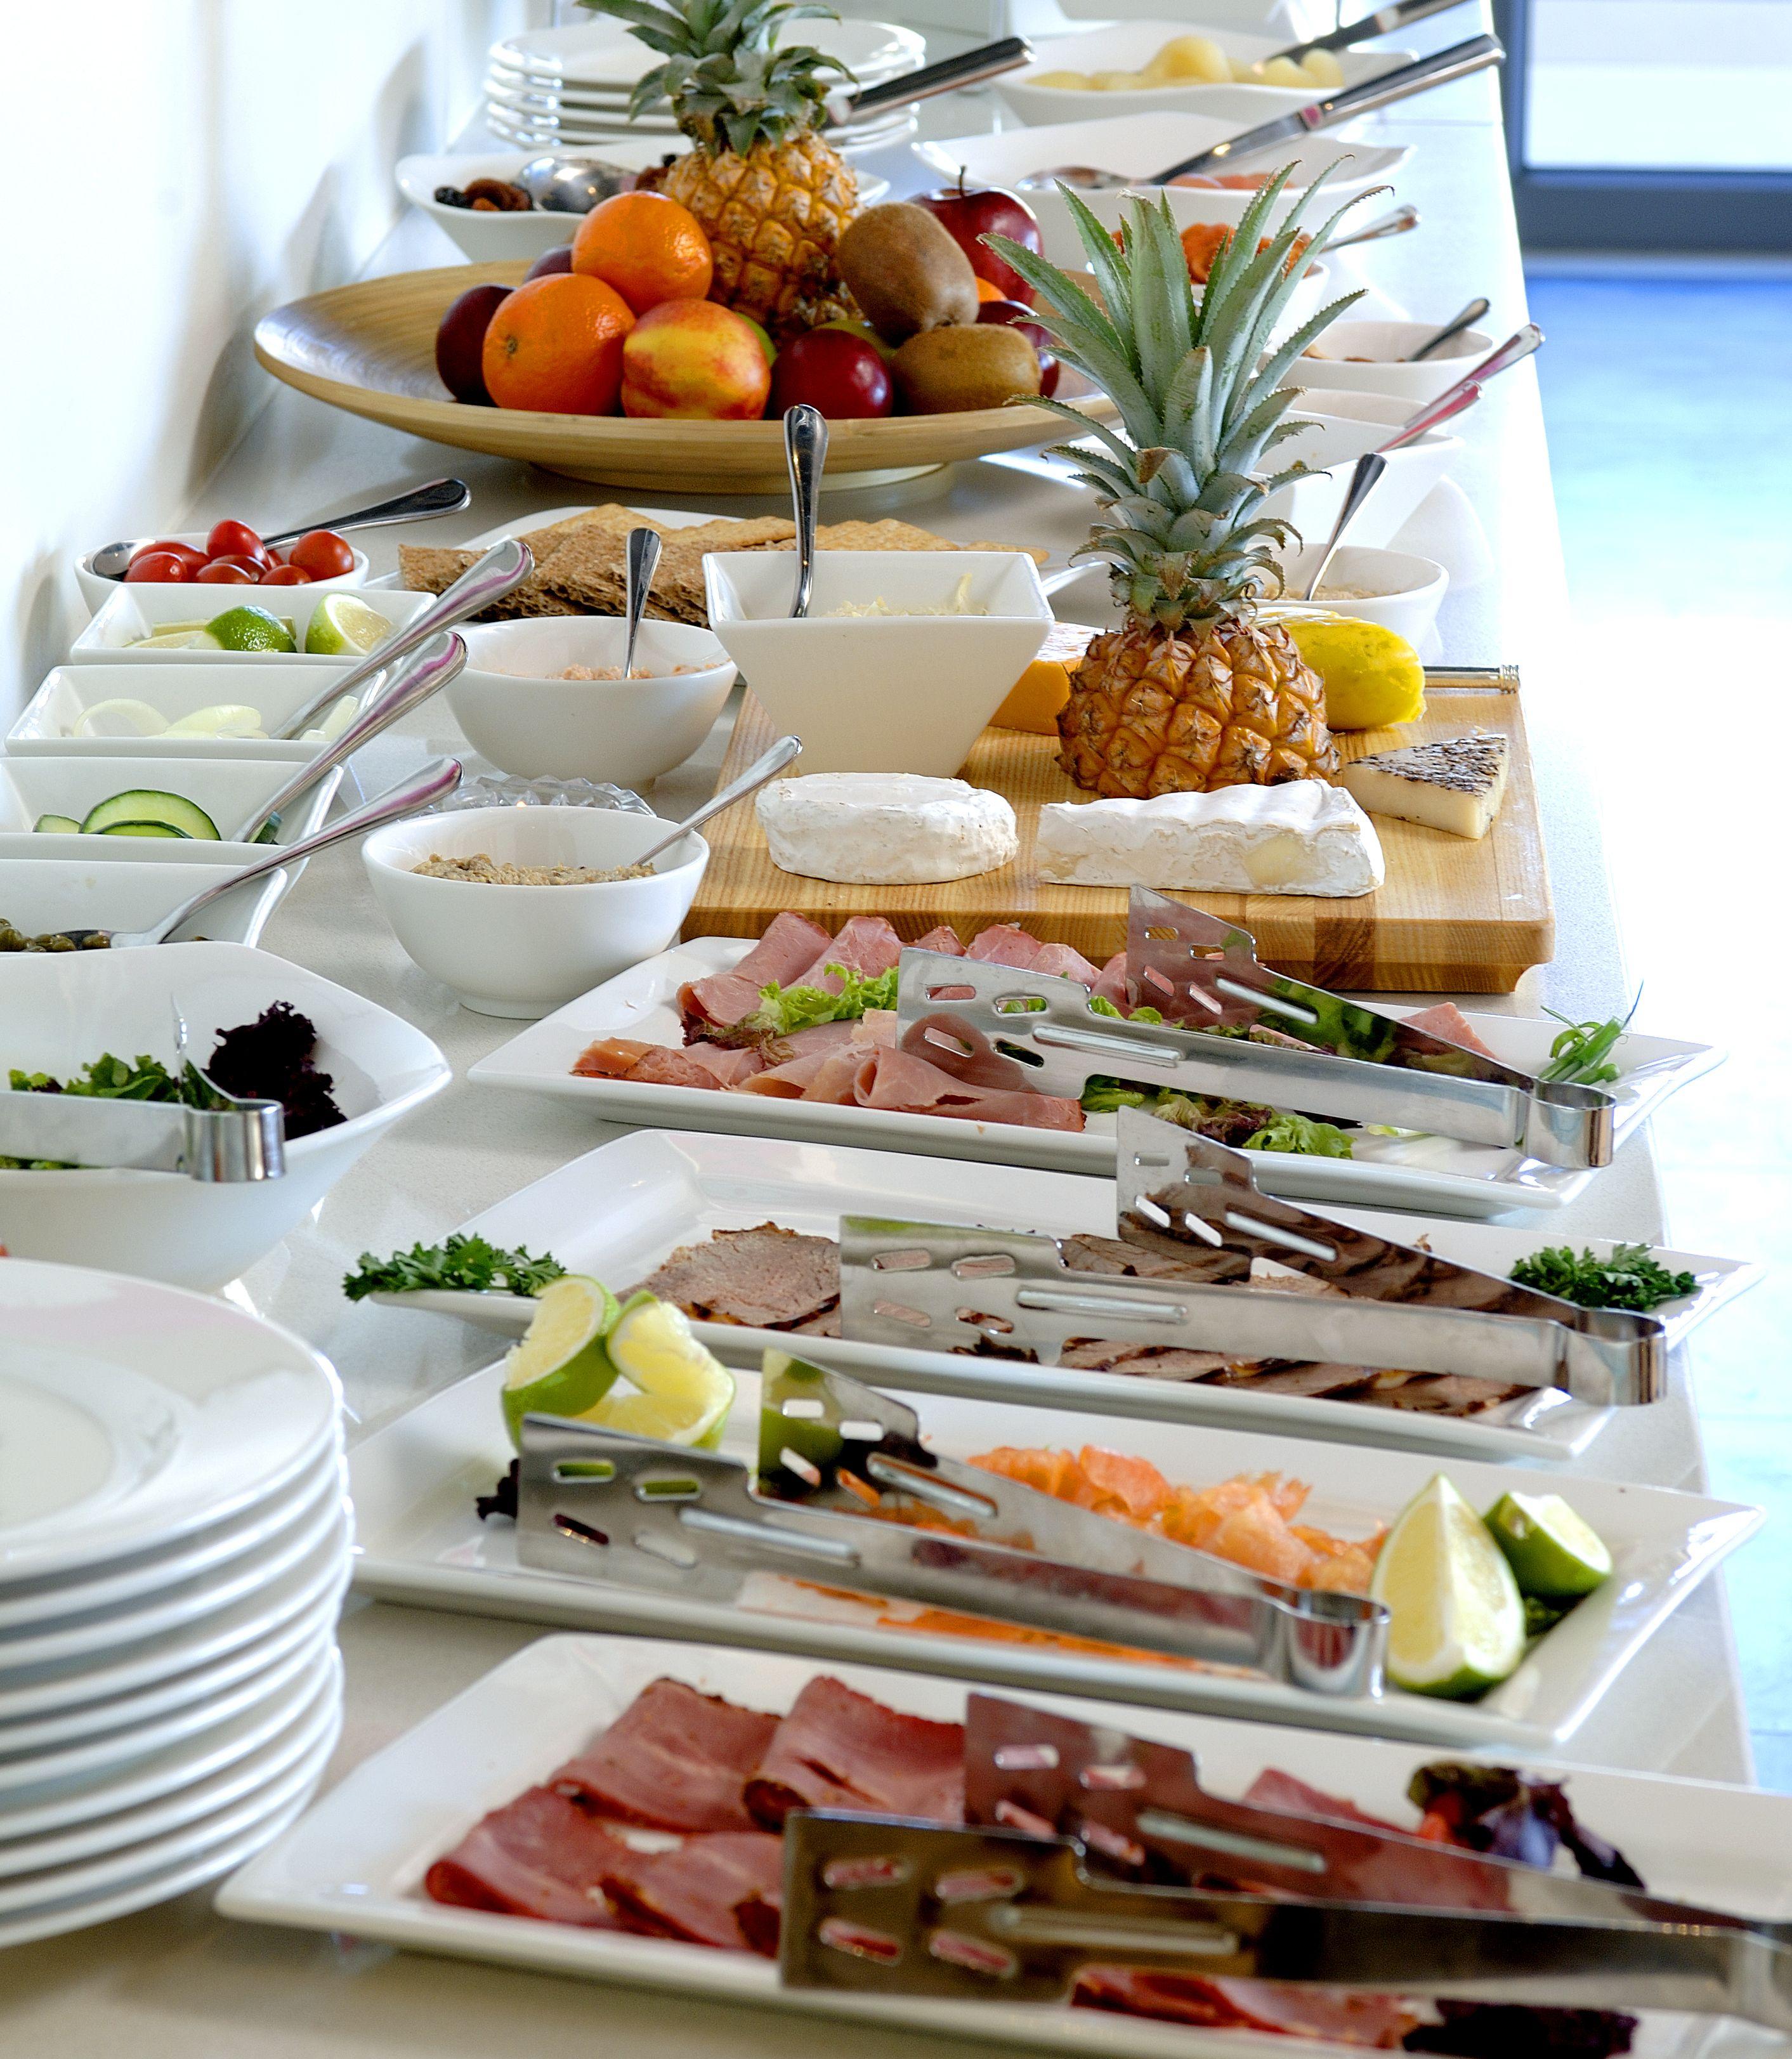 Breakfast buffet Breakfast buffet, Breakfast buffet